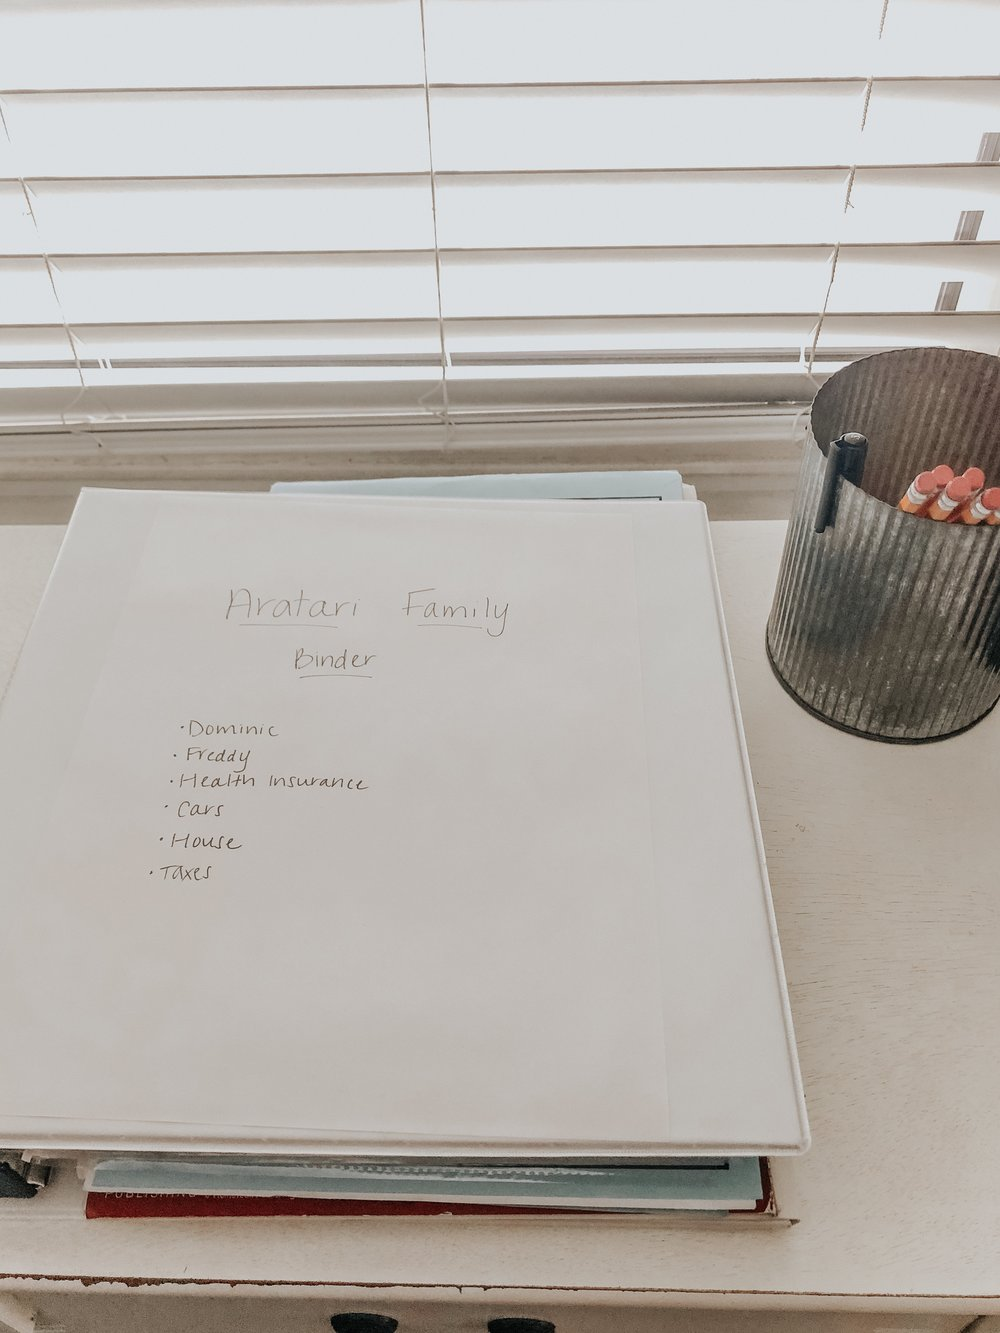 Paperwork organized